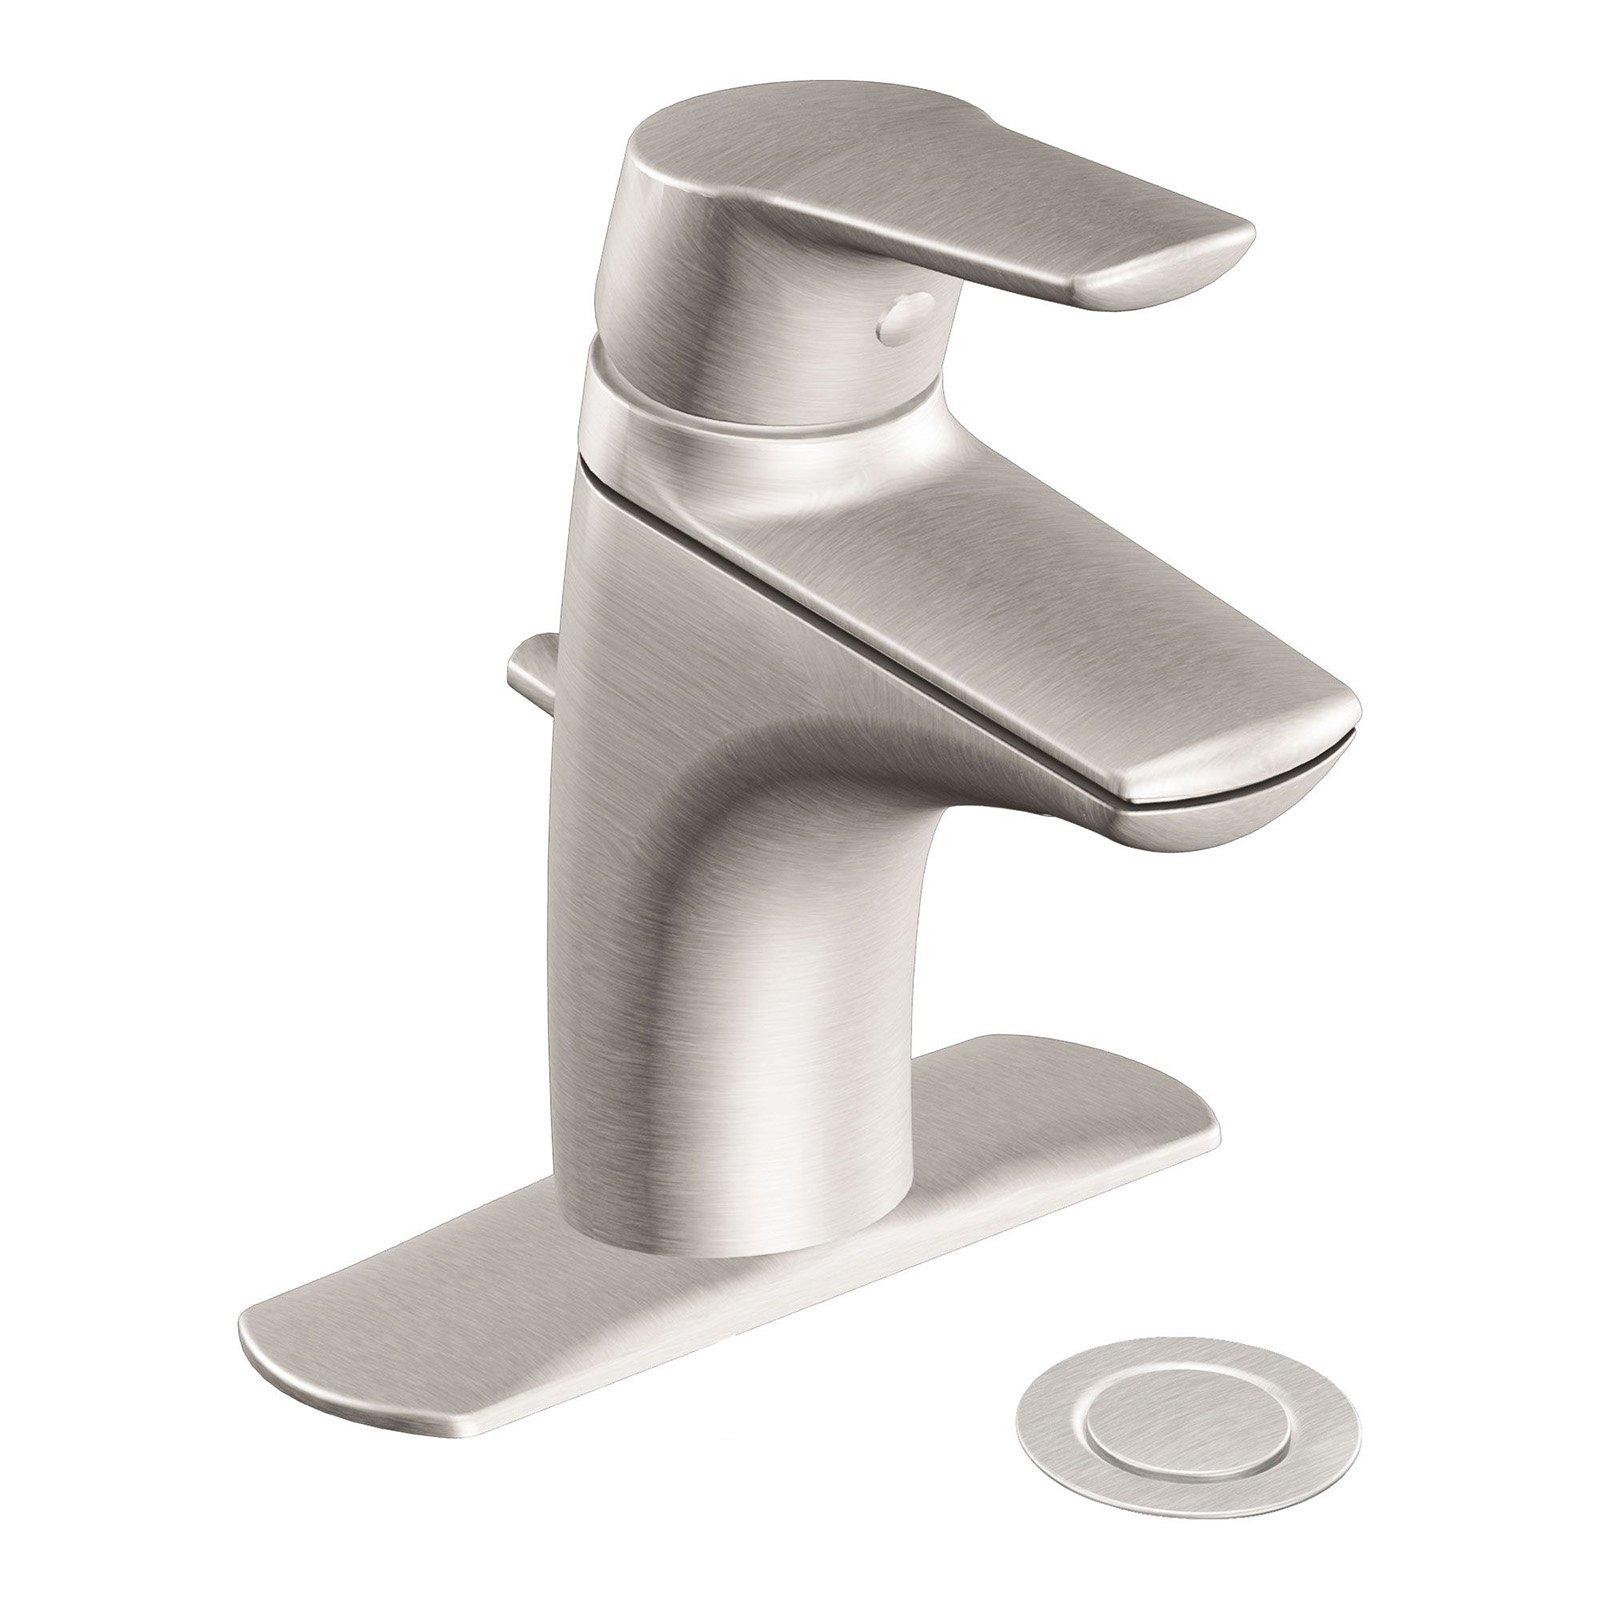 Moen Method 6810bn Single Handle Low Arc Bathroom Sink Faucet